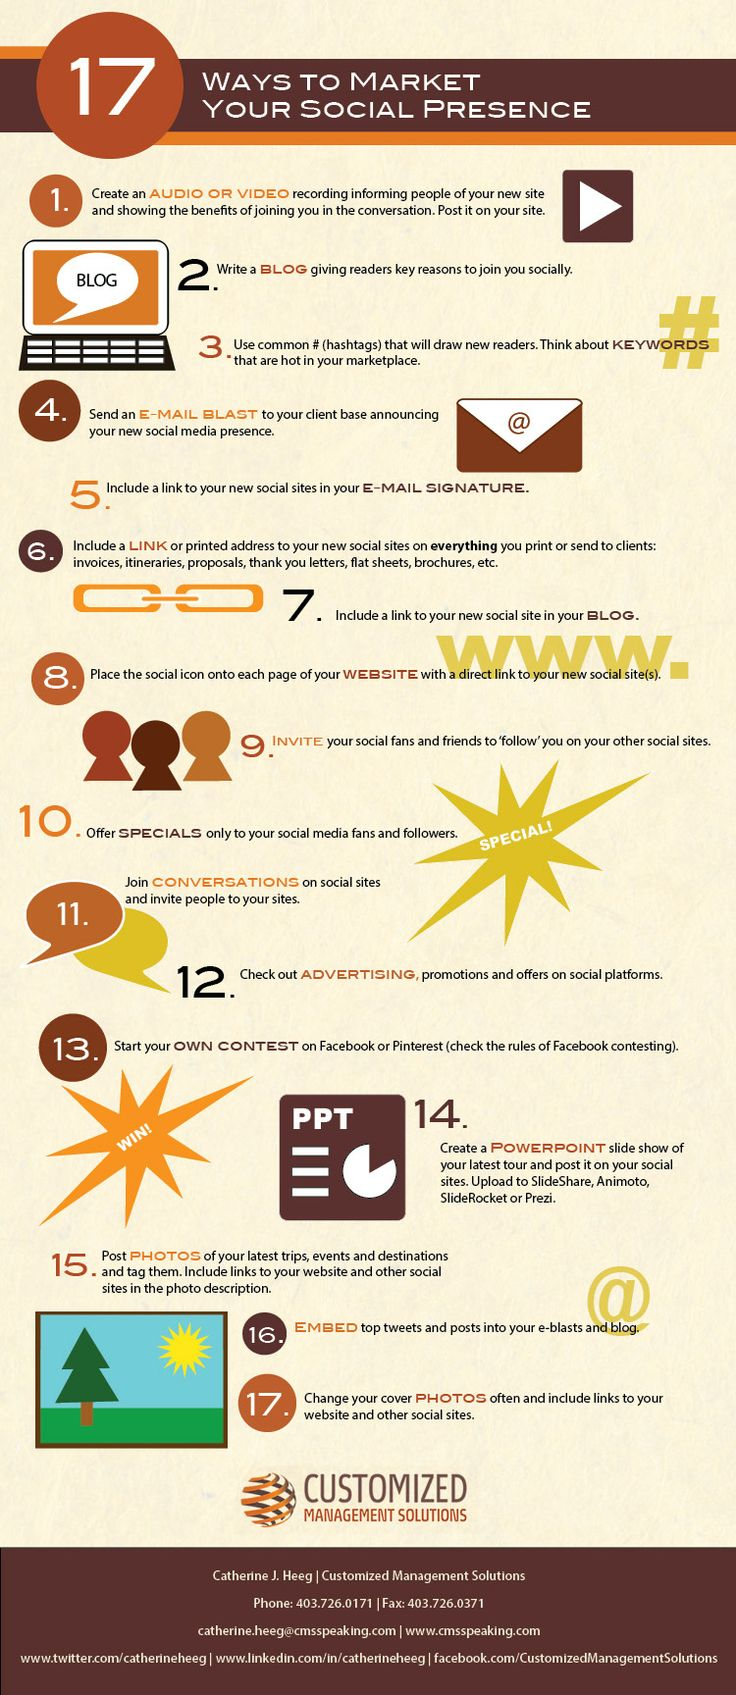 17 Ways to Market your Social Presence #Marketing #socialMedia #Facebook #Twitter #Google #Blog